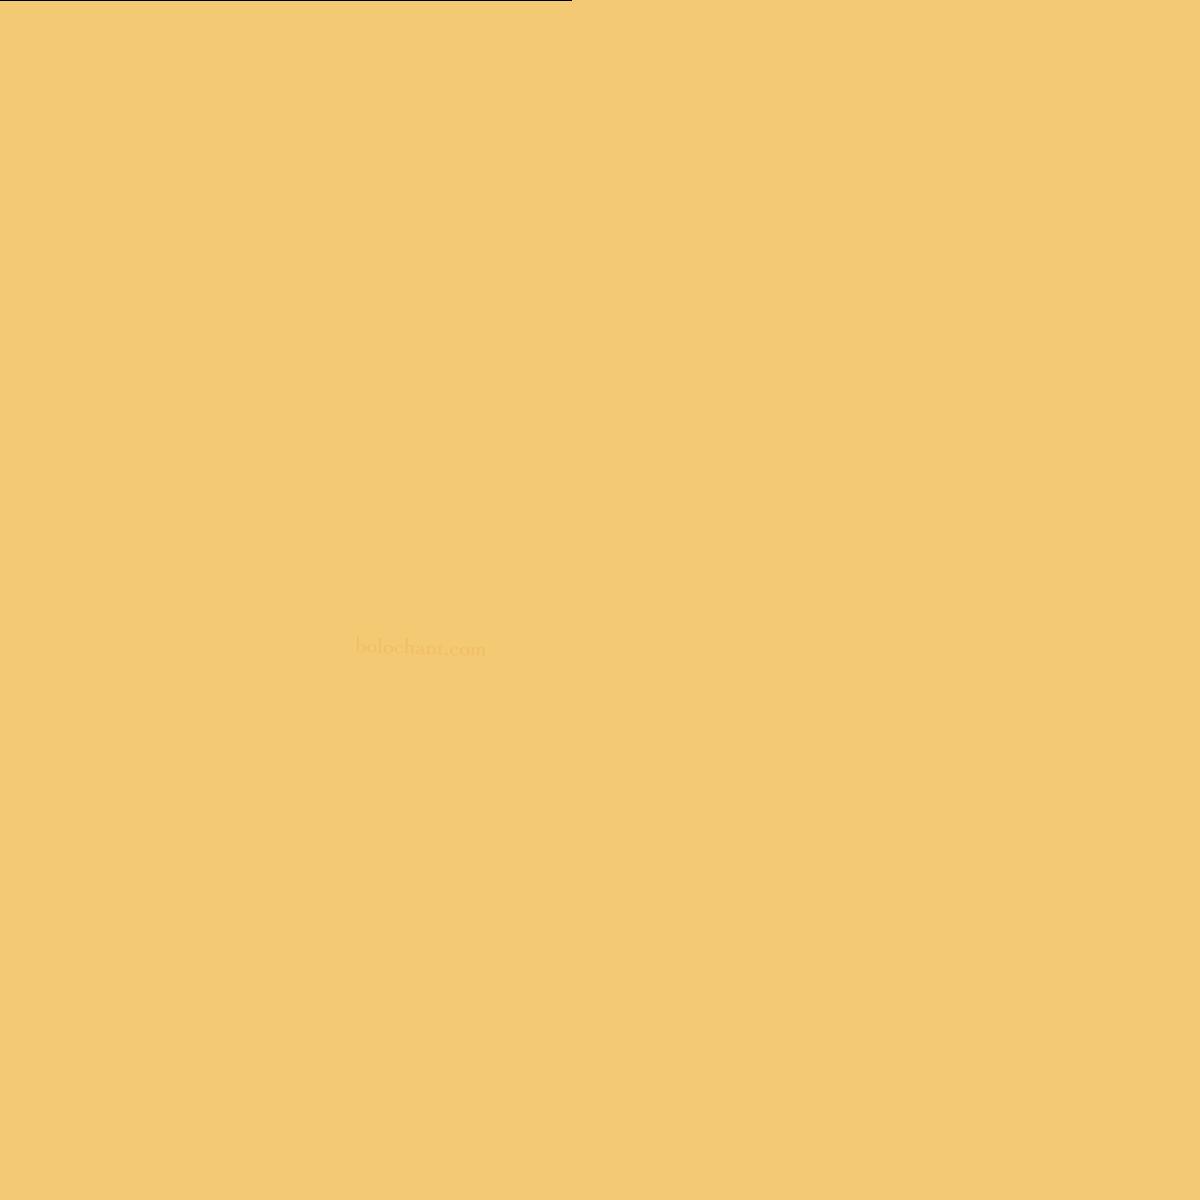 Velar Mouth Position